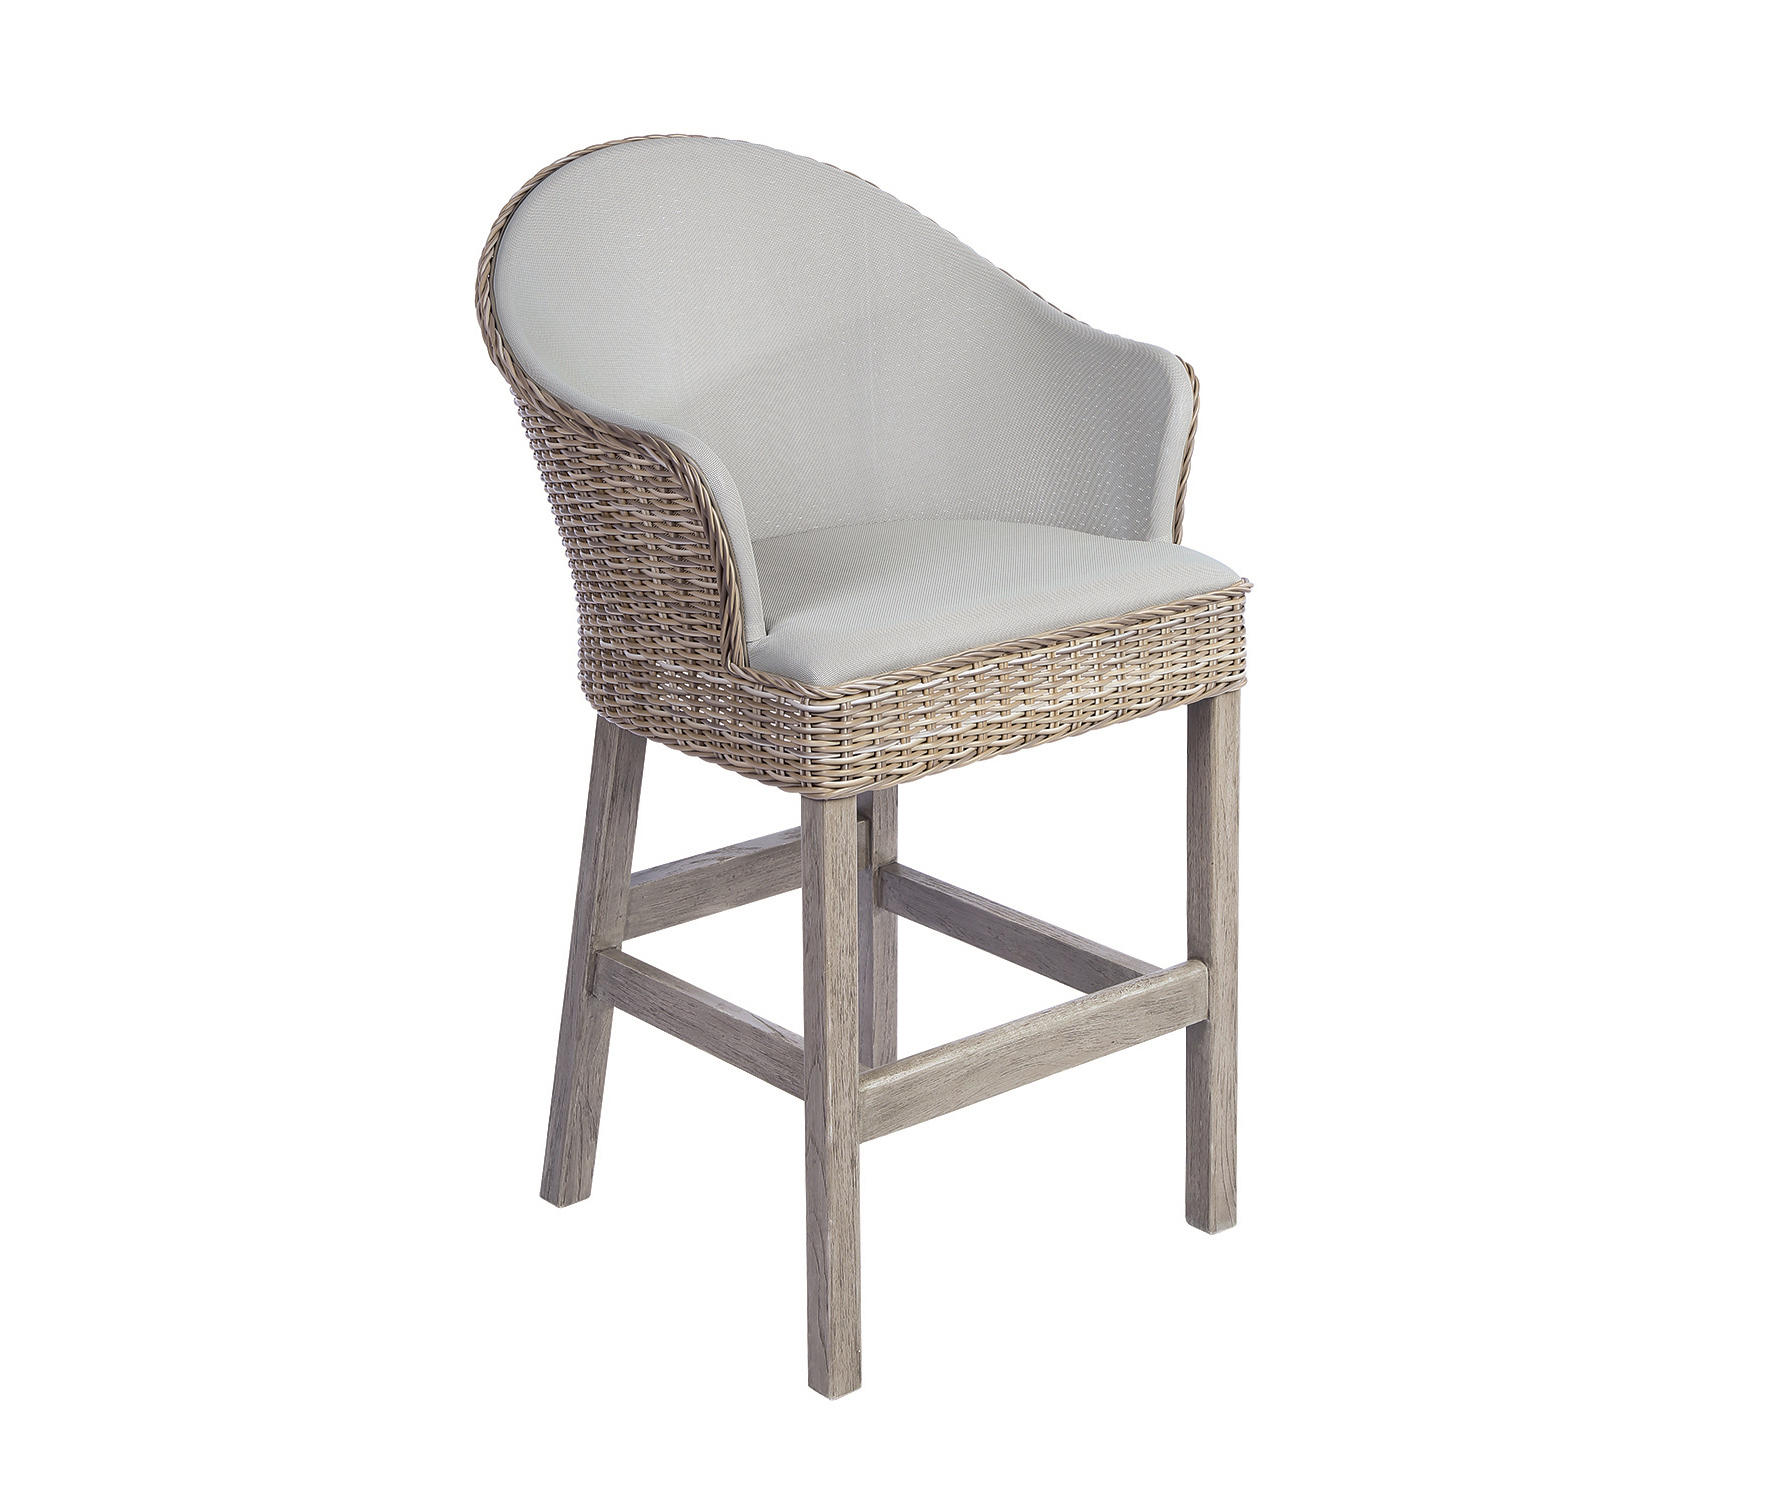 Milano bar chair garten barhocker von kingsley bate for Barhocker usa